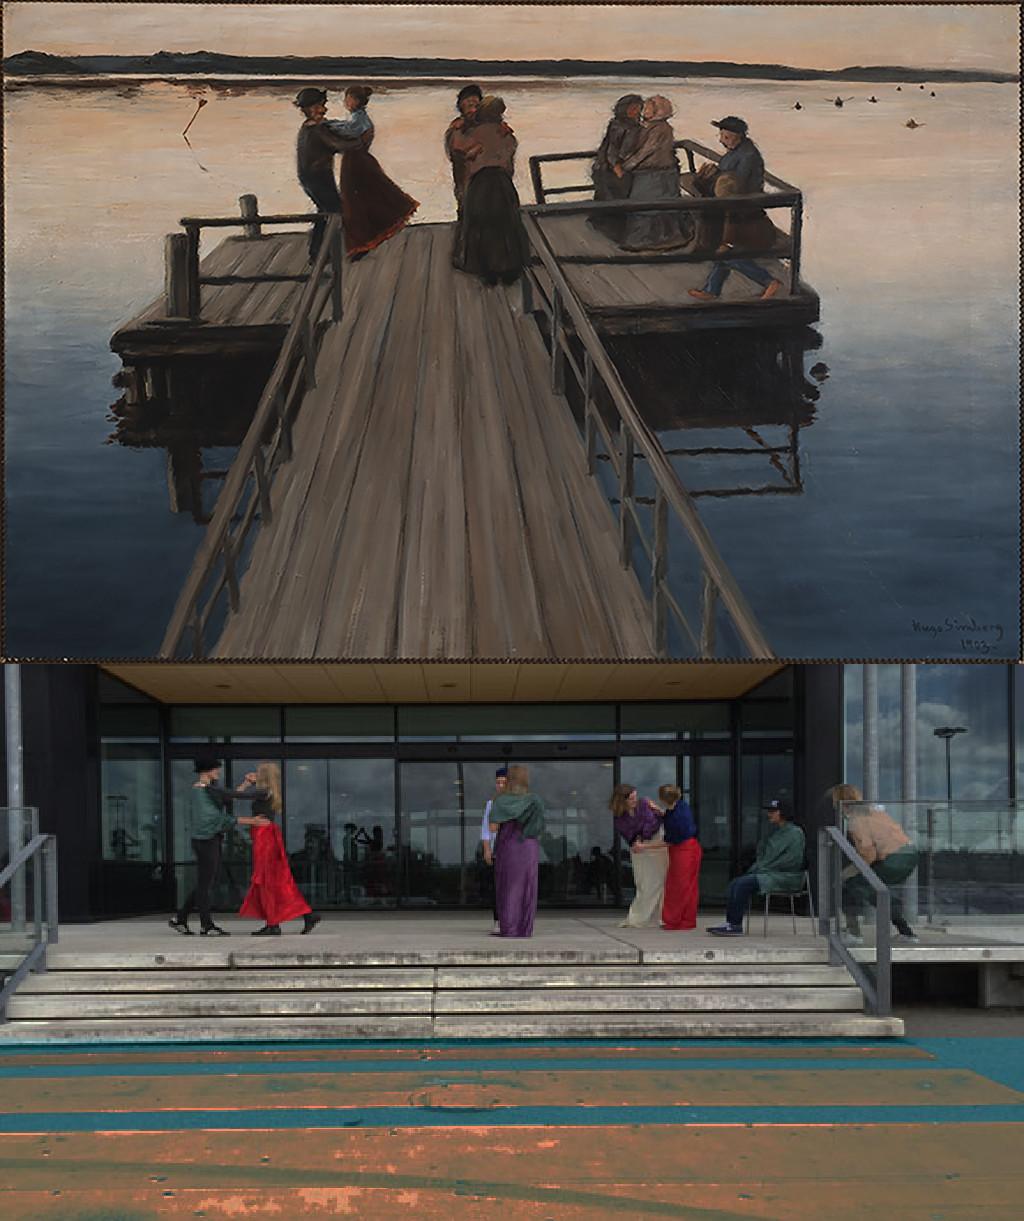 Dance on the Jetty, Hugo Simberg (1873 –1917) vanGo'd by Louise, Laura, Emma, Emma, Breshna, Sofie, Emilie, Johanne, Asta